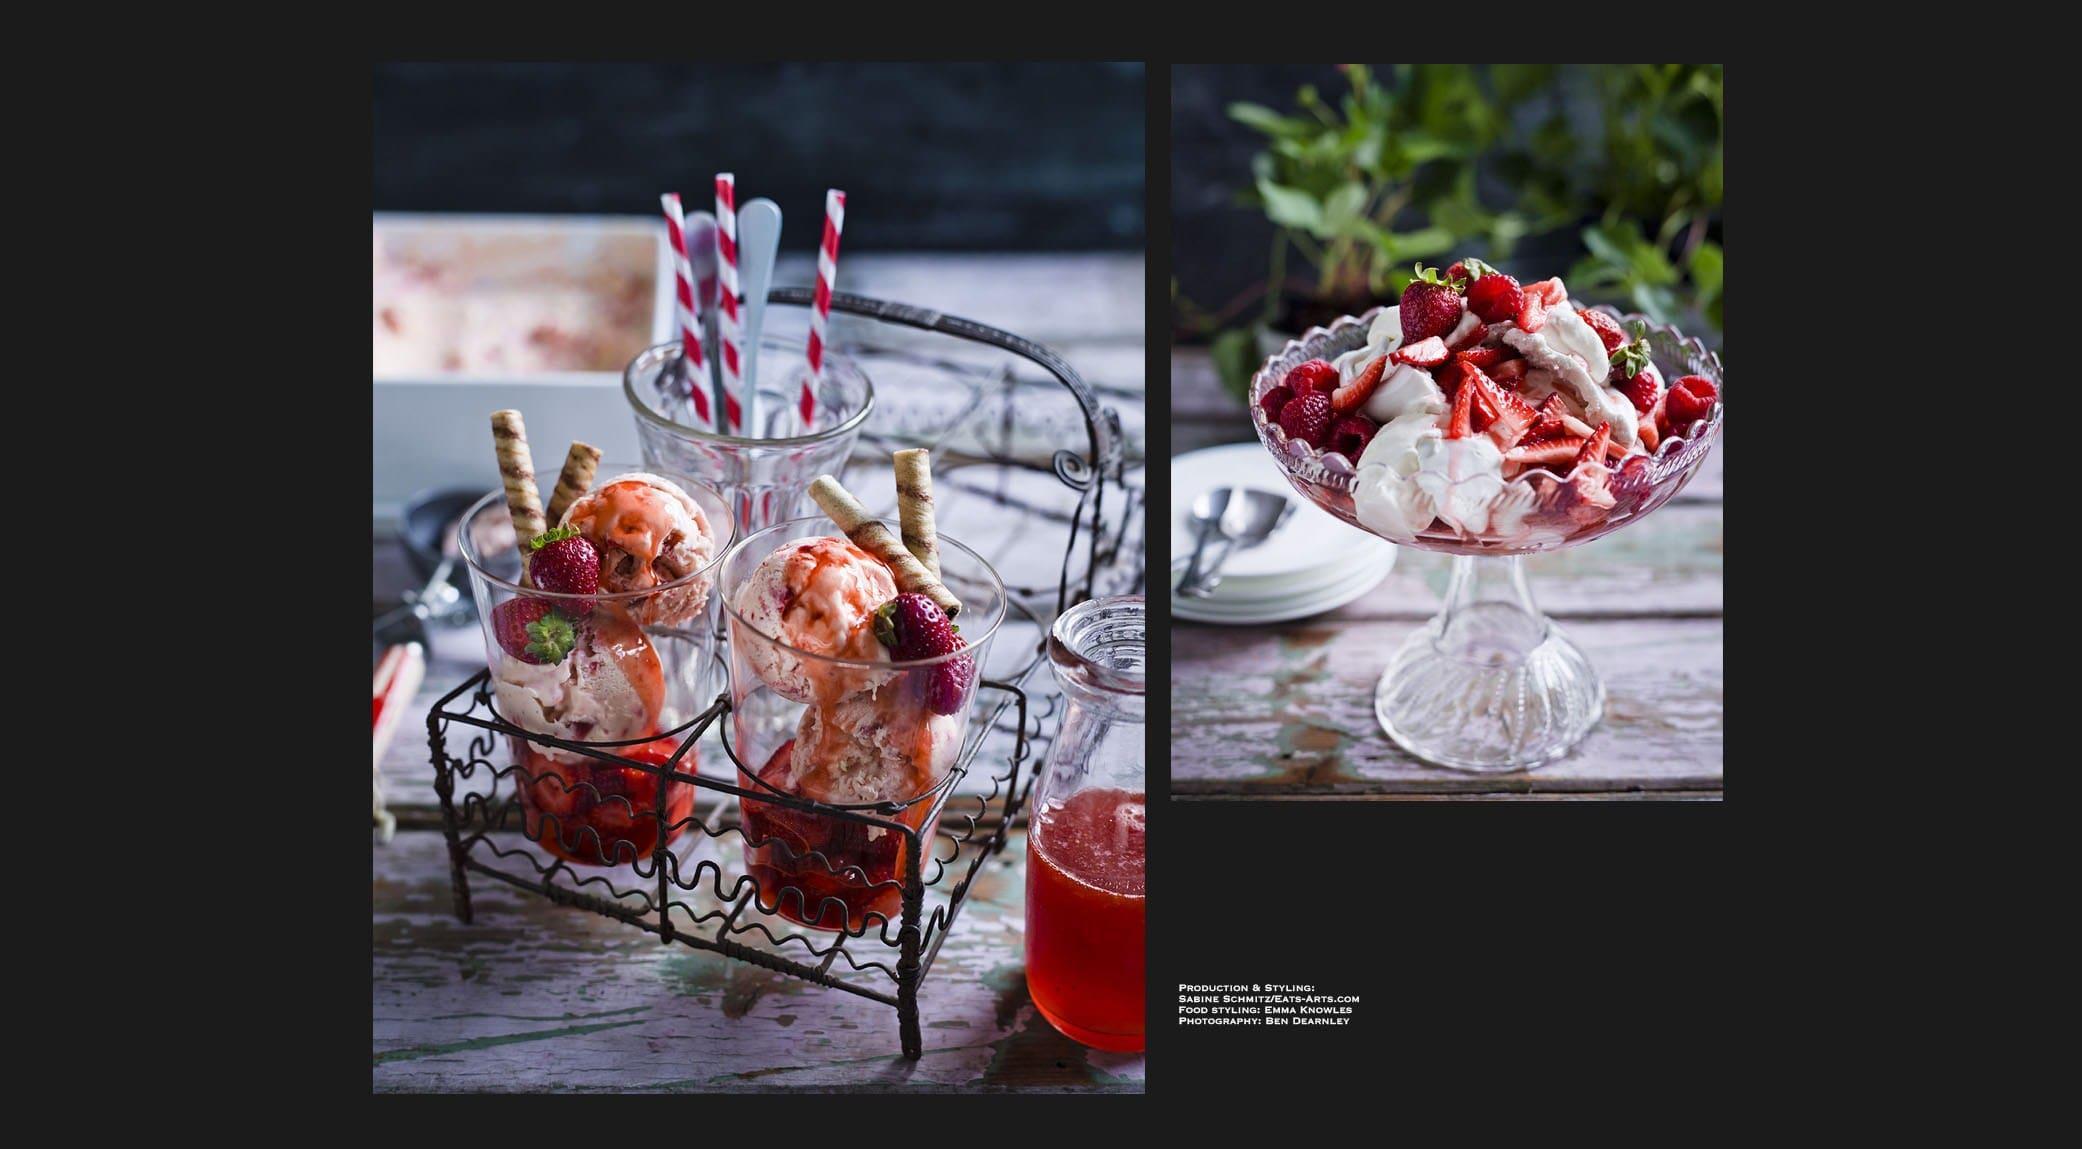 original_009-Strawberry-copyright-Eats-Arts-02.jpg